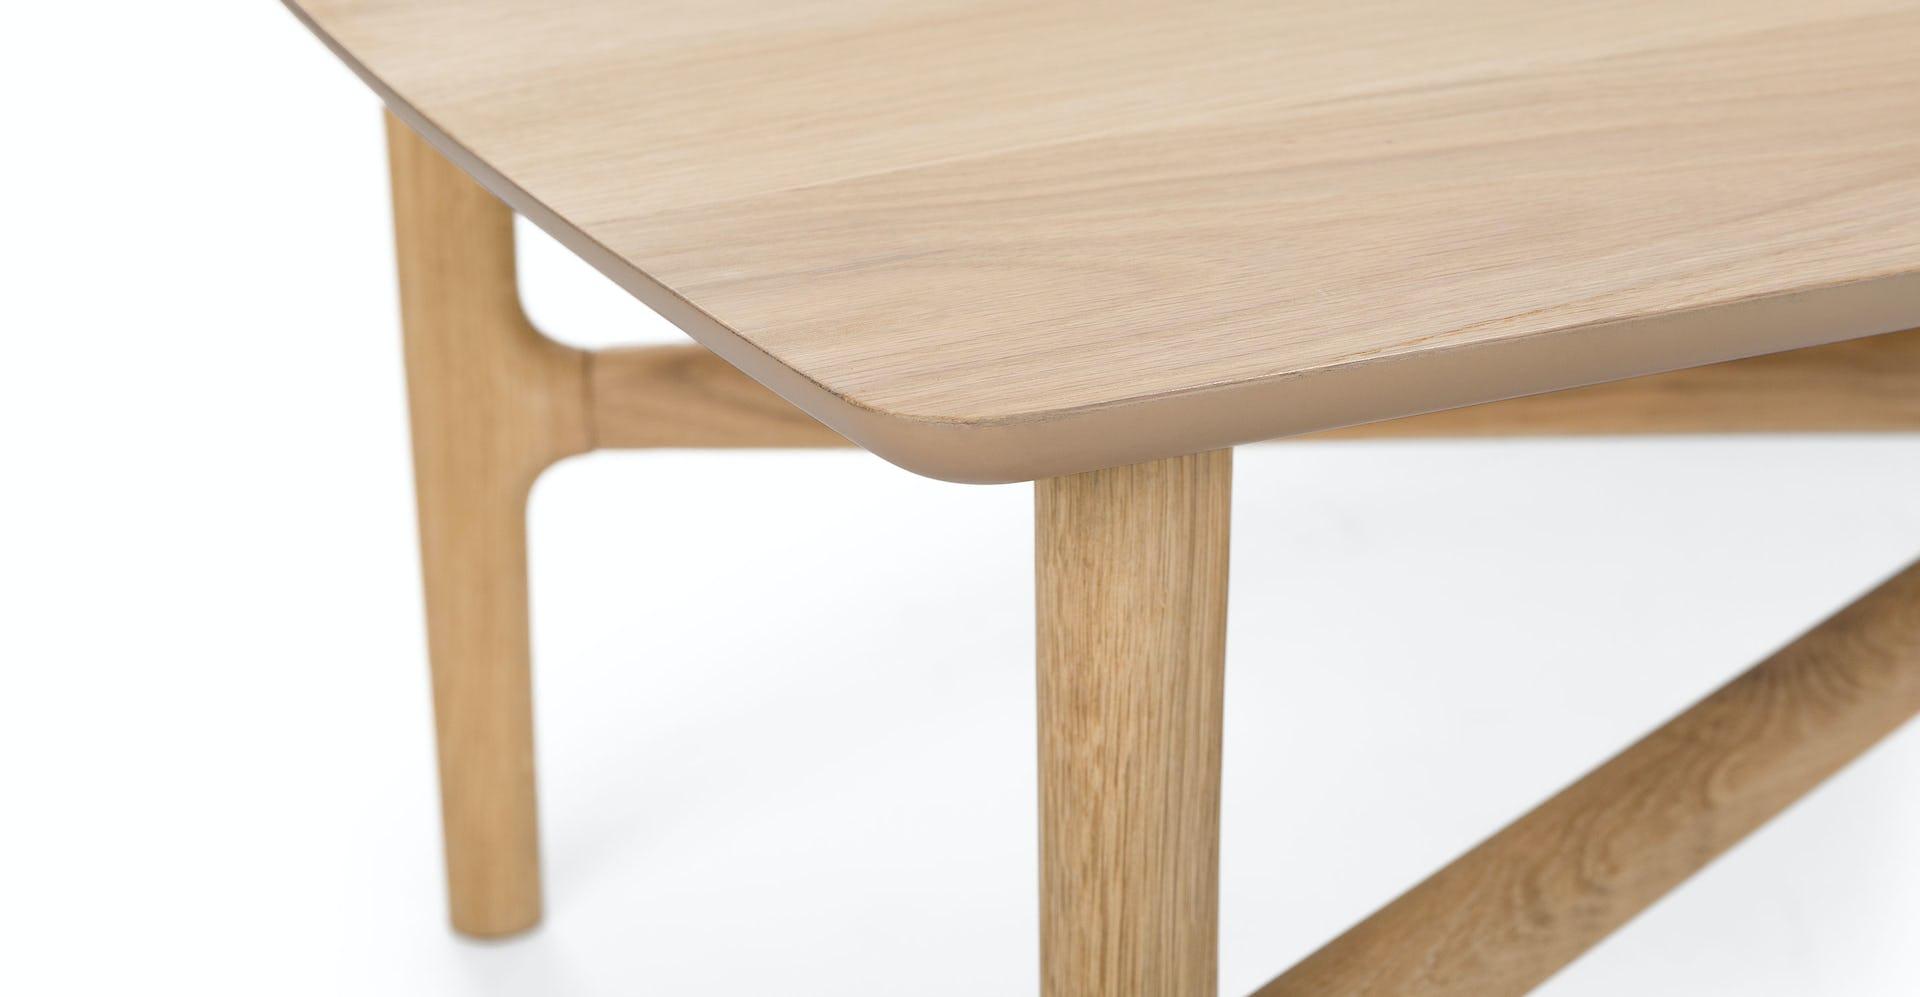 Phenomenal Brezza Light Oak Rectangular Coffee Table Machost Co Dining Chair Design Ideas Machostcouk